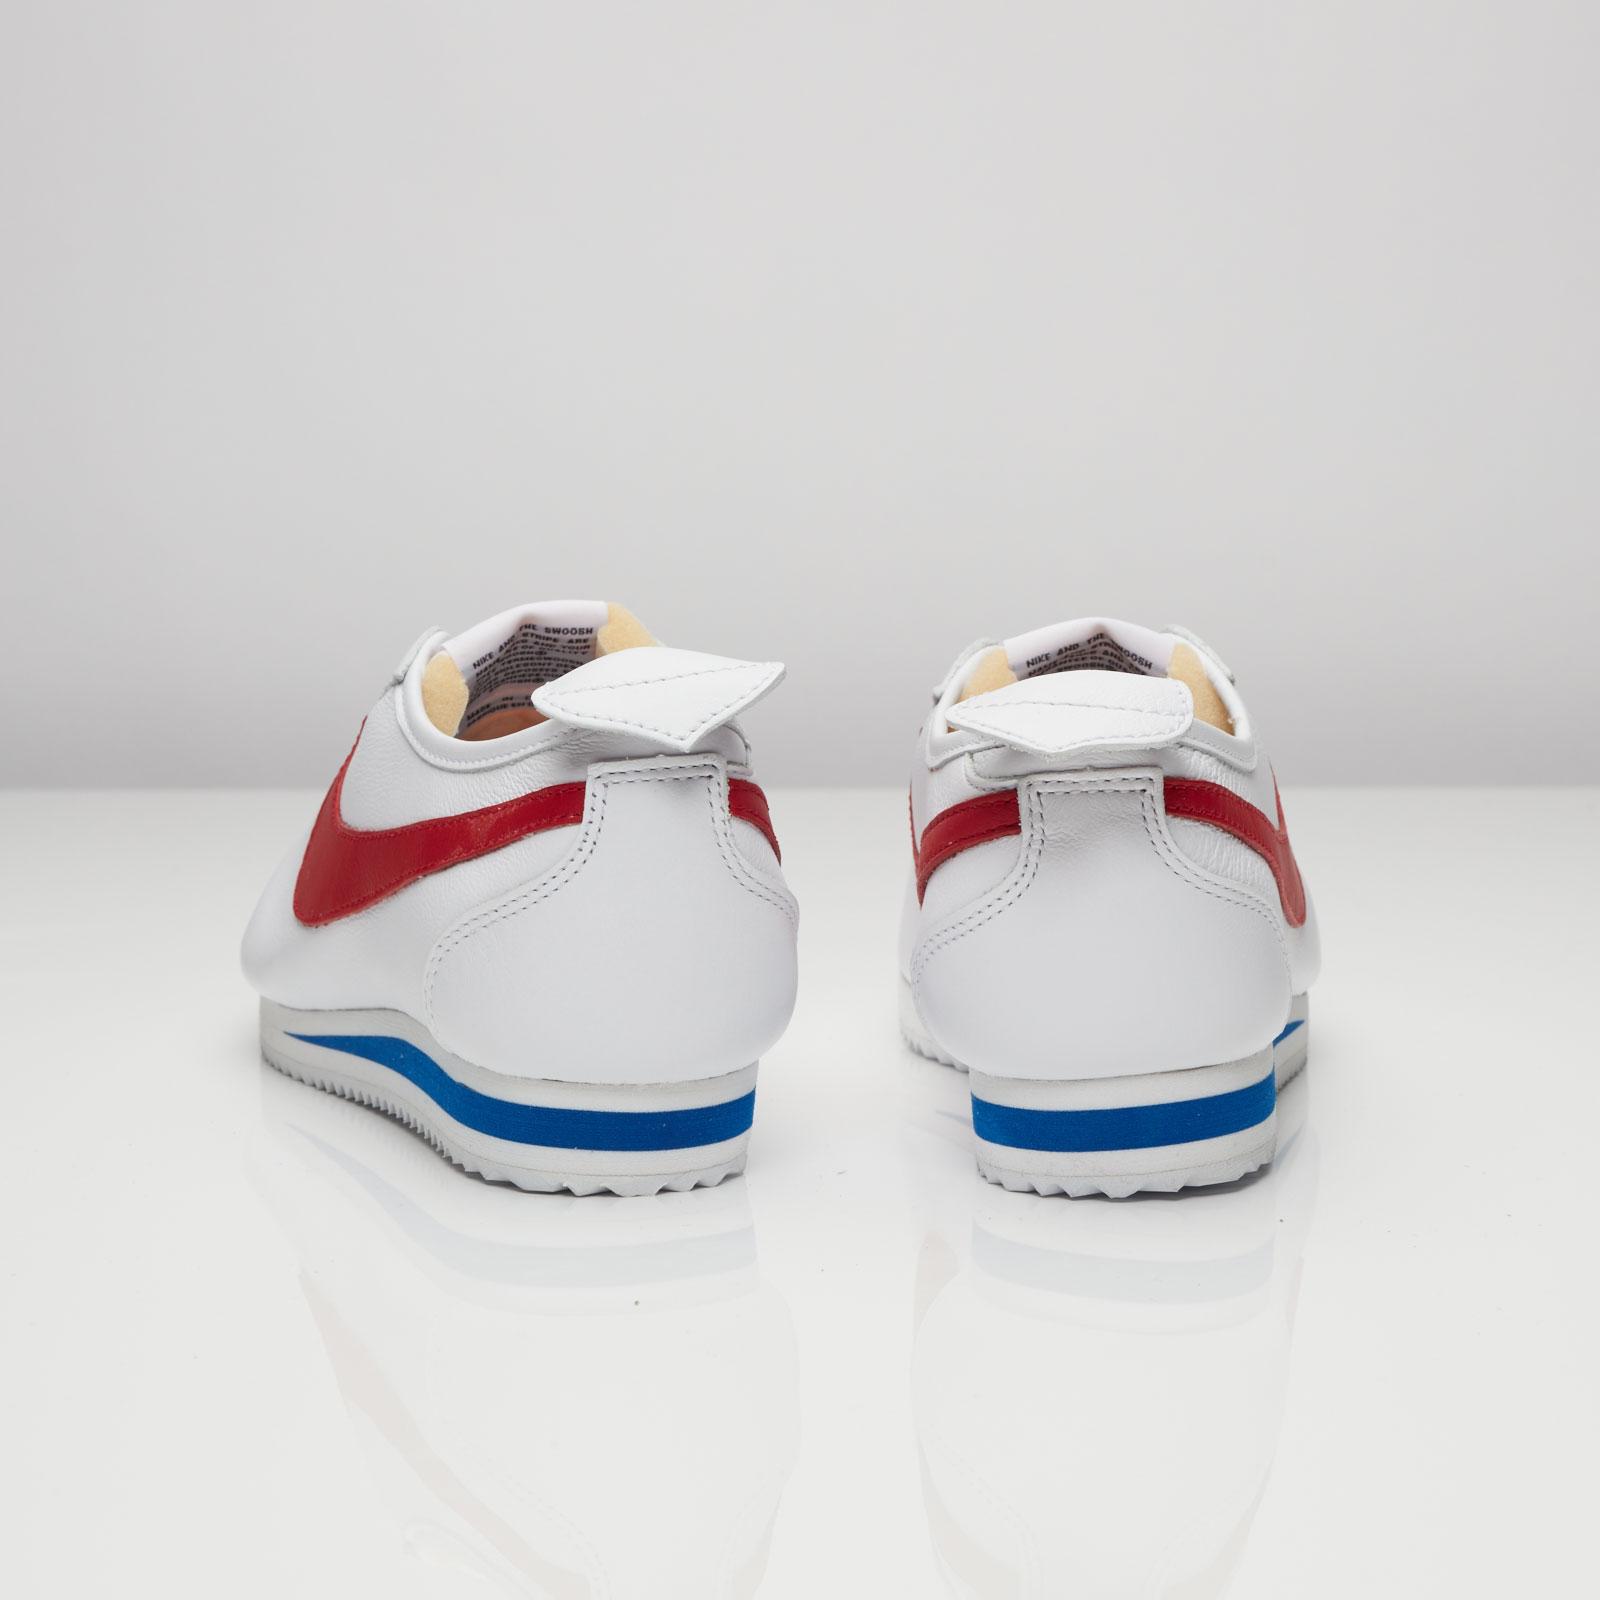 huge discount d13de 11d56 Nike Wmns Nike Cortez 72 - 847126-101 - Sneakersnstuff ...